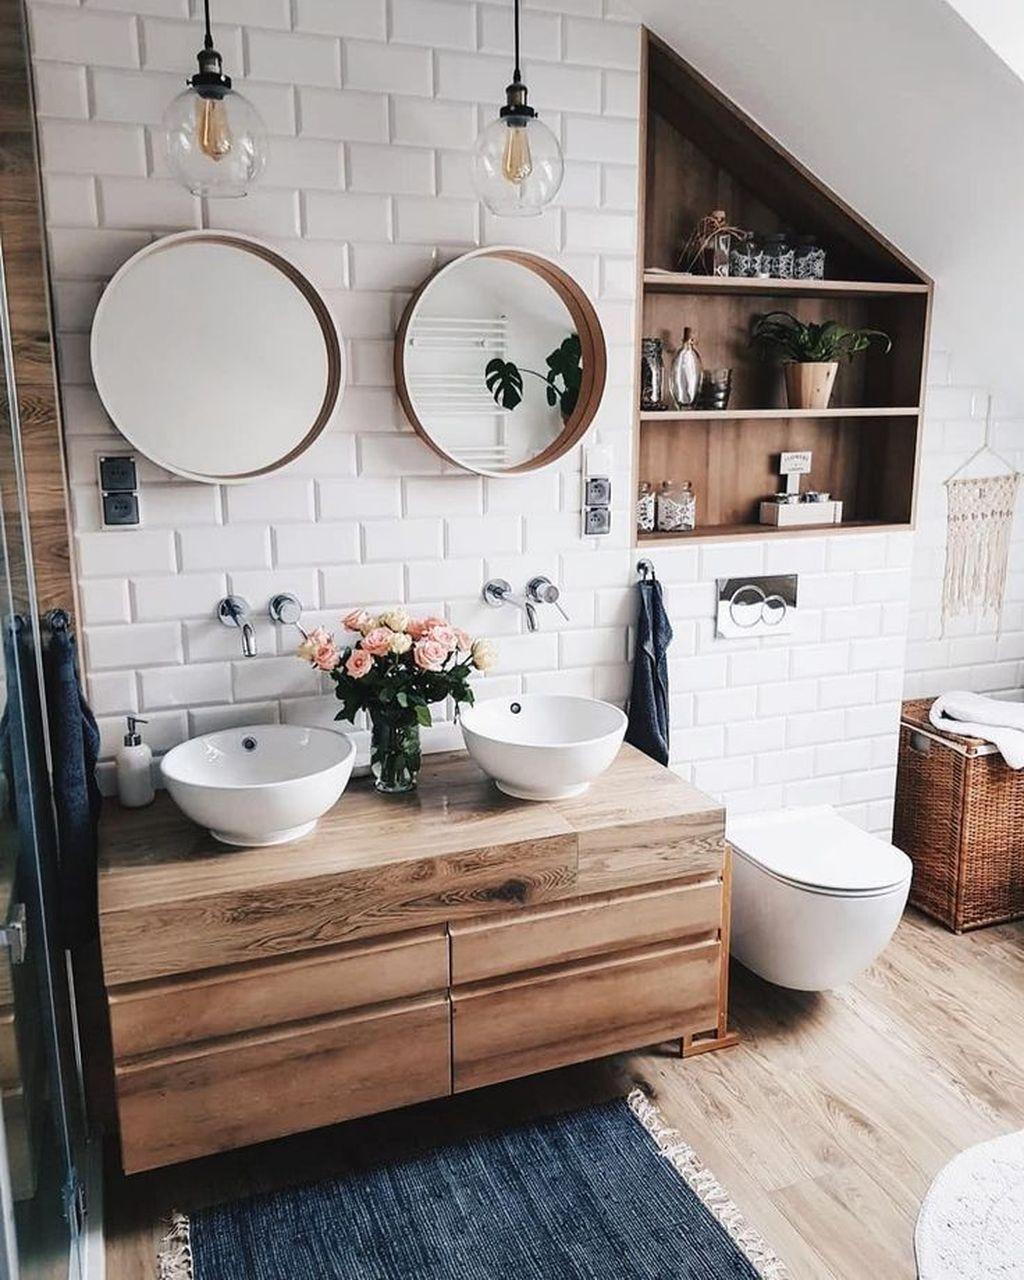 Inspiring Small Modern Farmhouse Bathroom Design Ideas 29